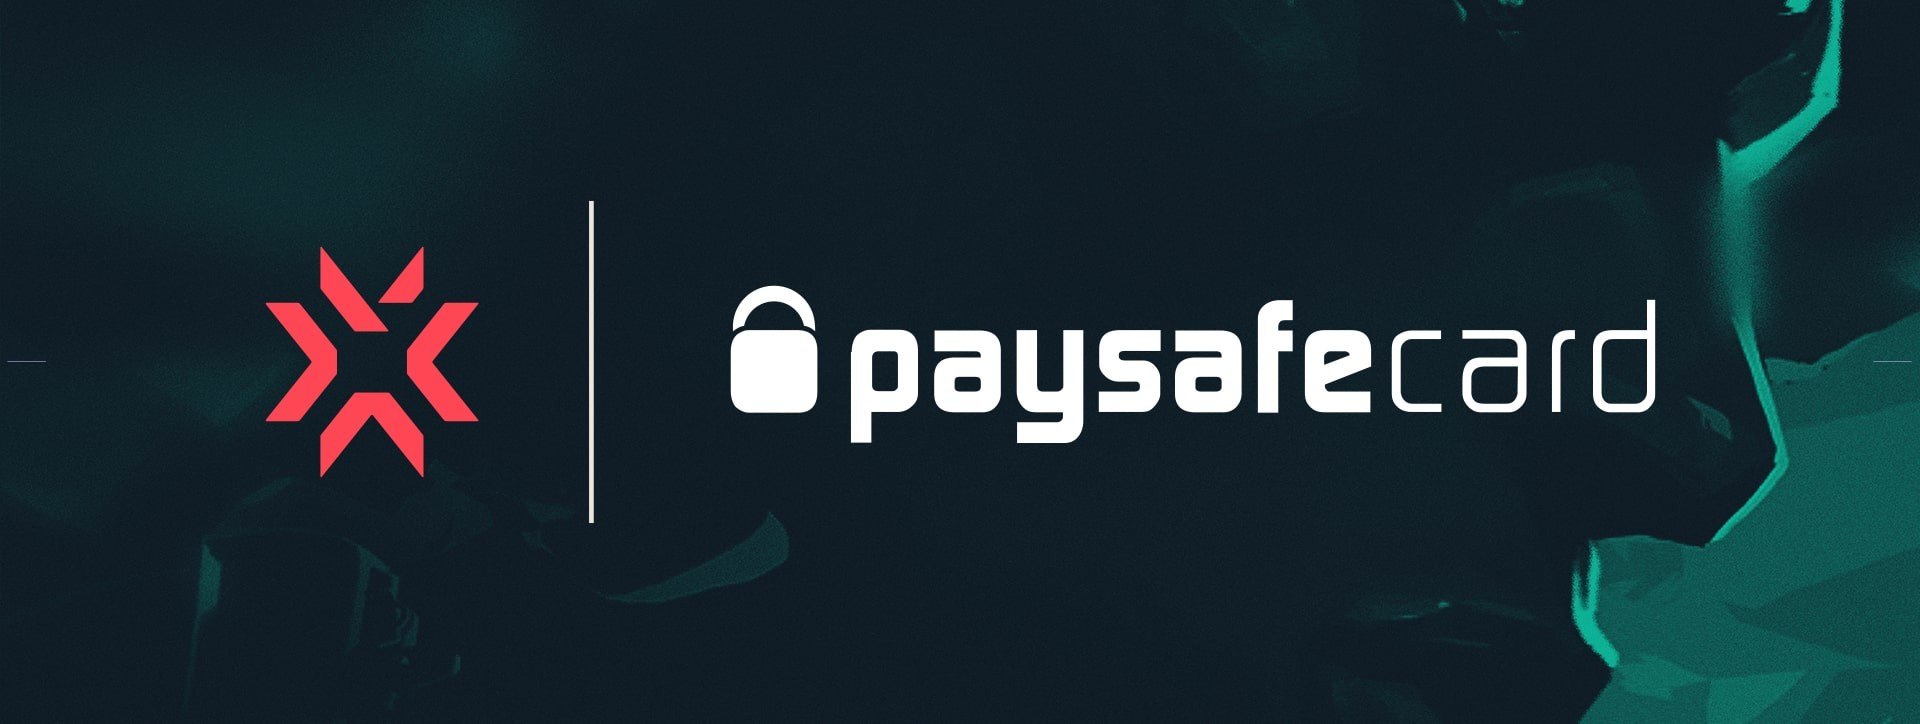 paysafecard joins VCT EMEA as presenting partner